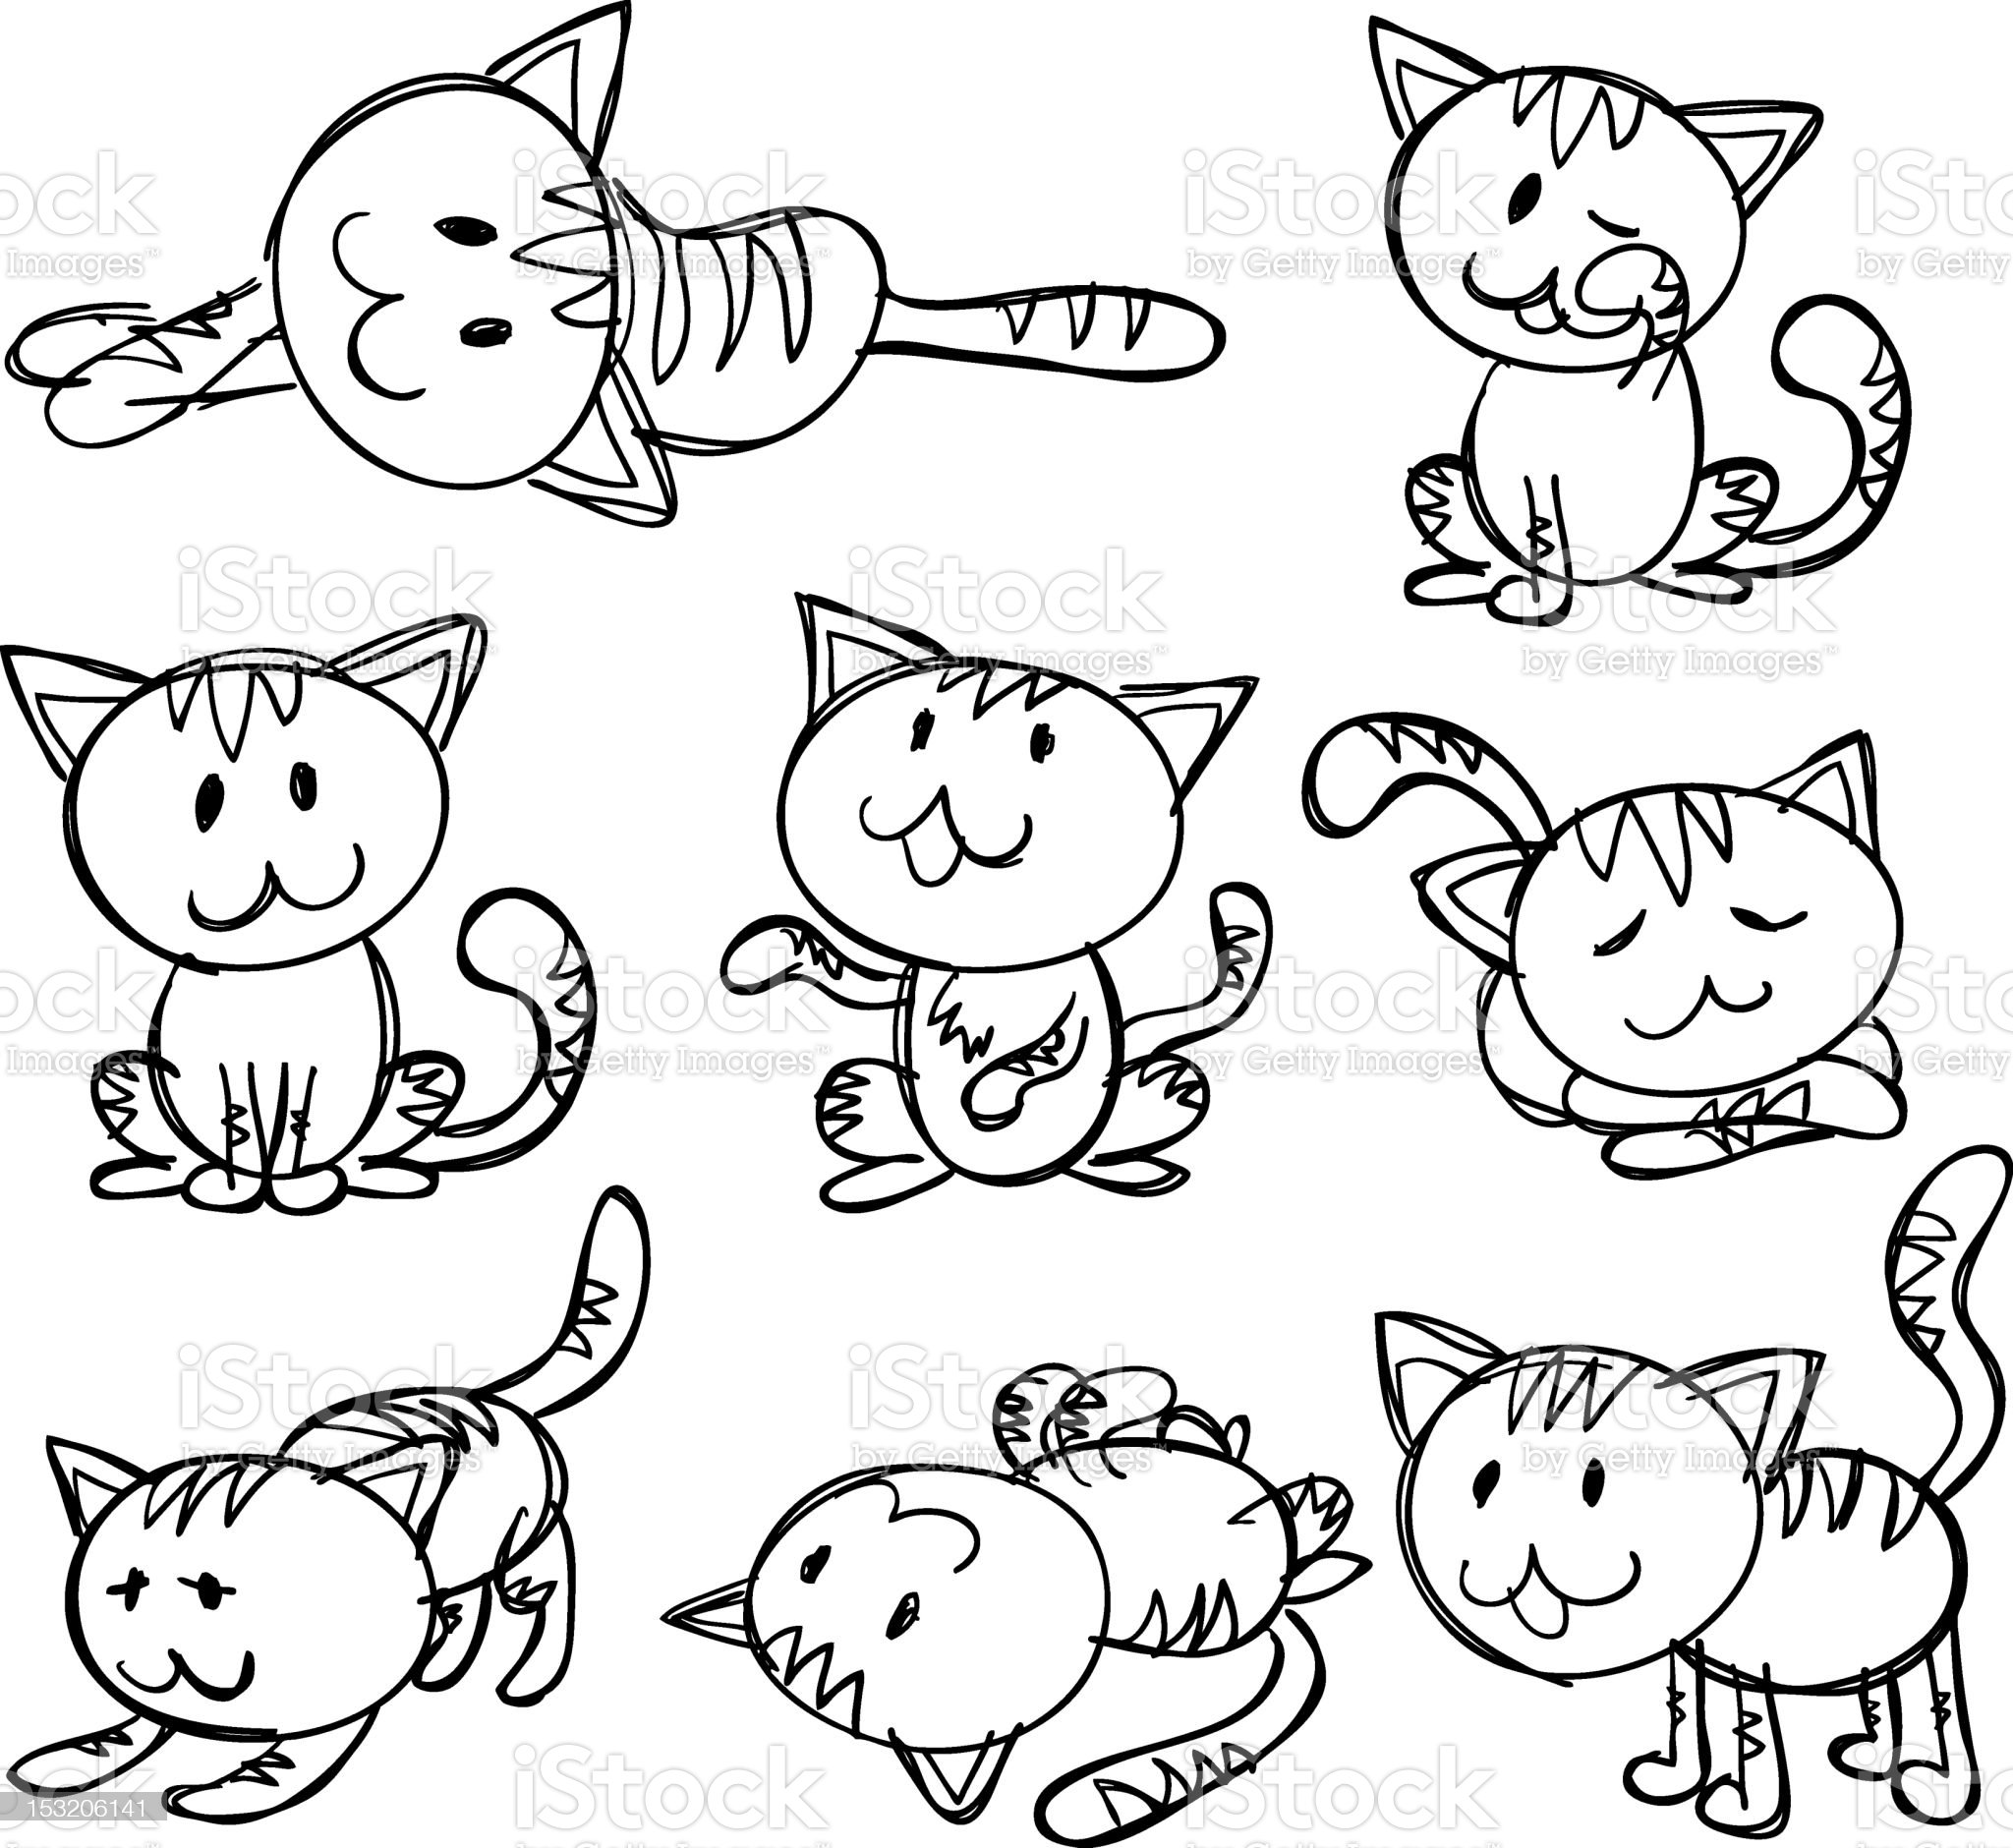 Animal Cat royalty-free stock photo